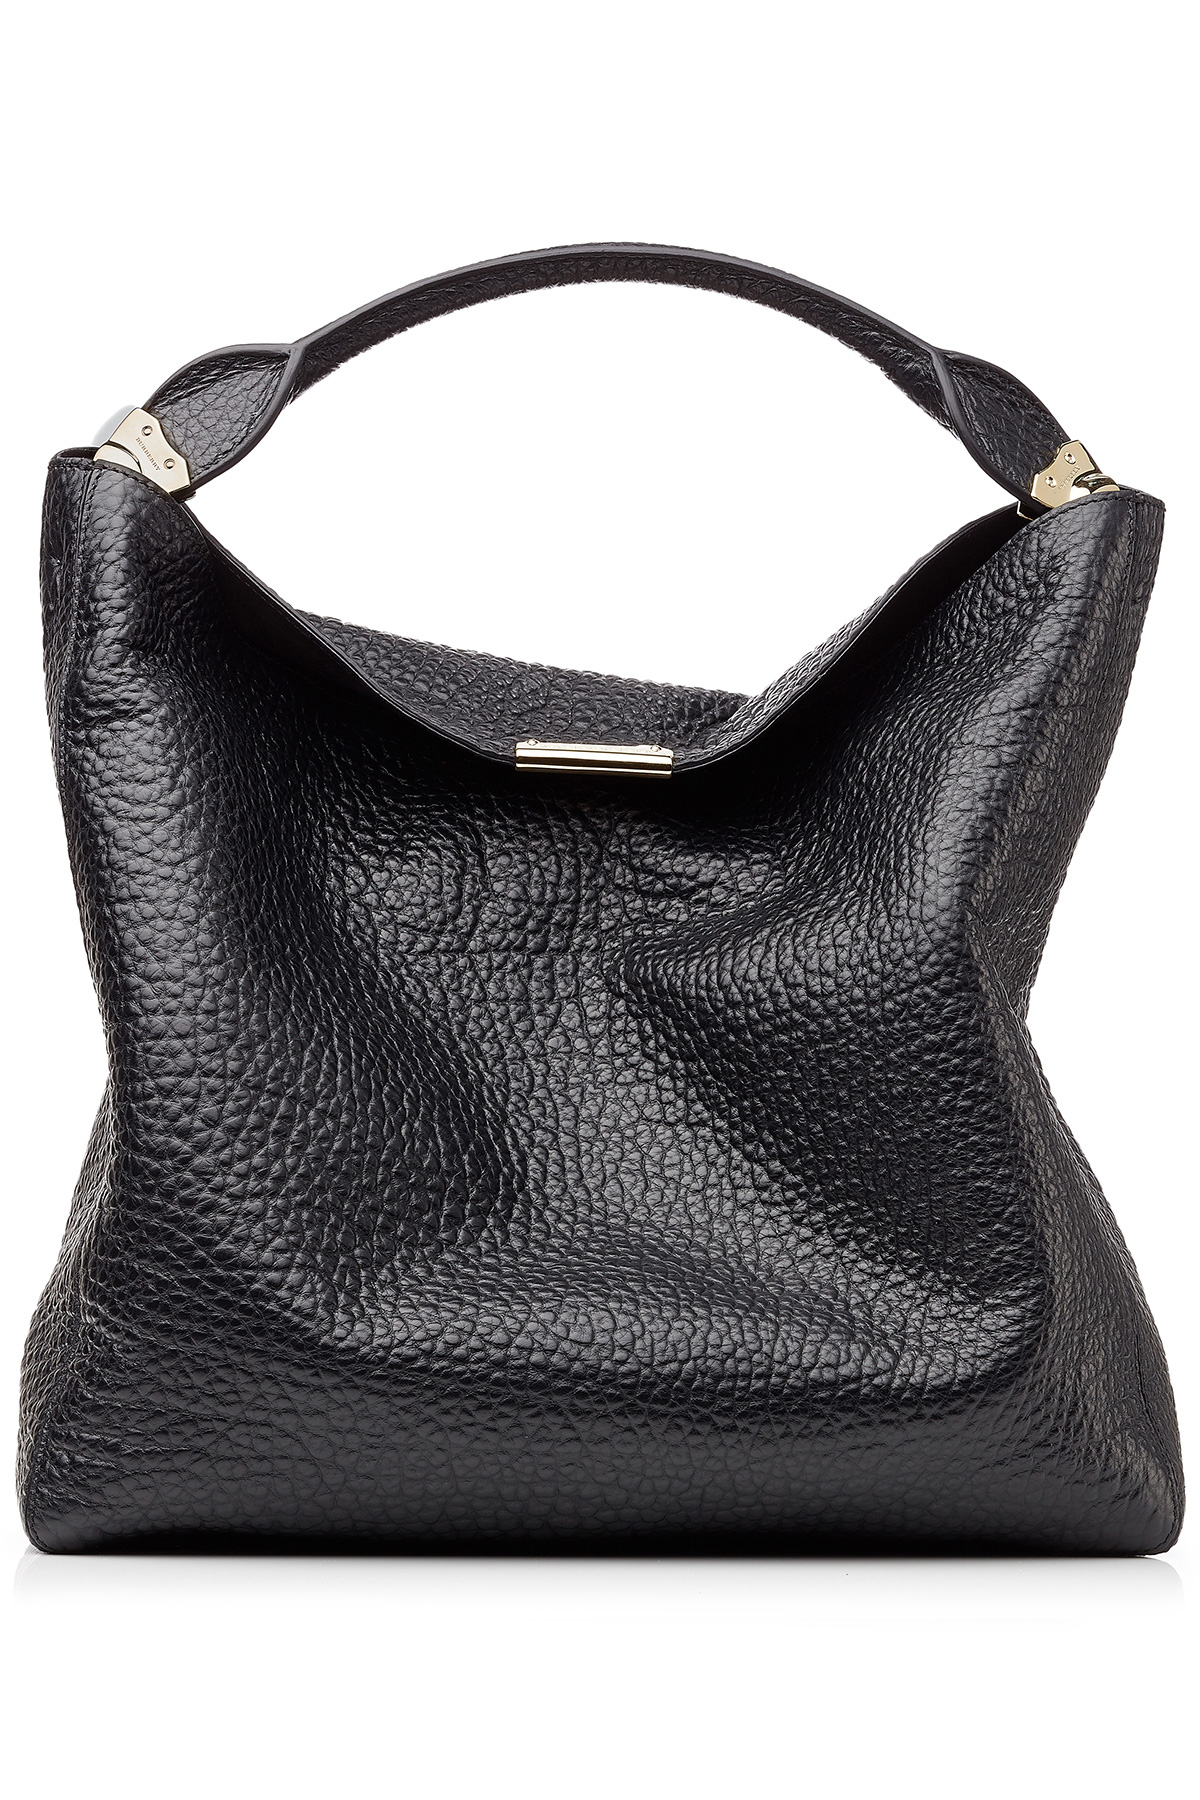 9ab8ff6d70e7 Lyst - Burberry Lindburn Embossed Leather Hobo Bag - Black in Black